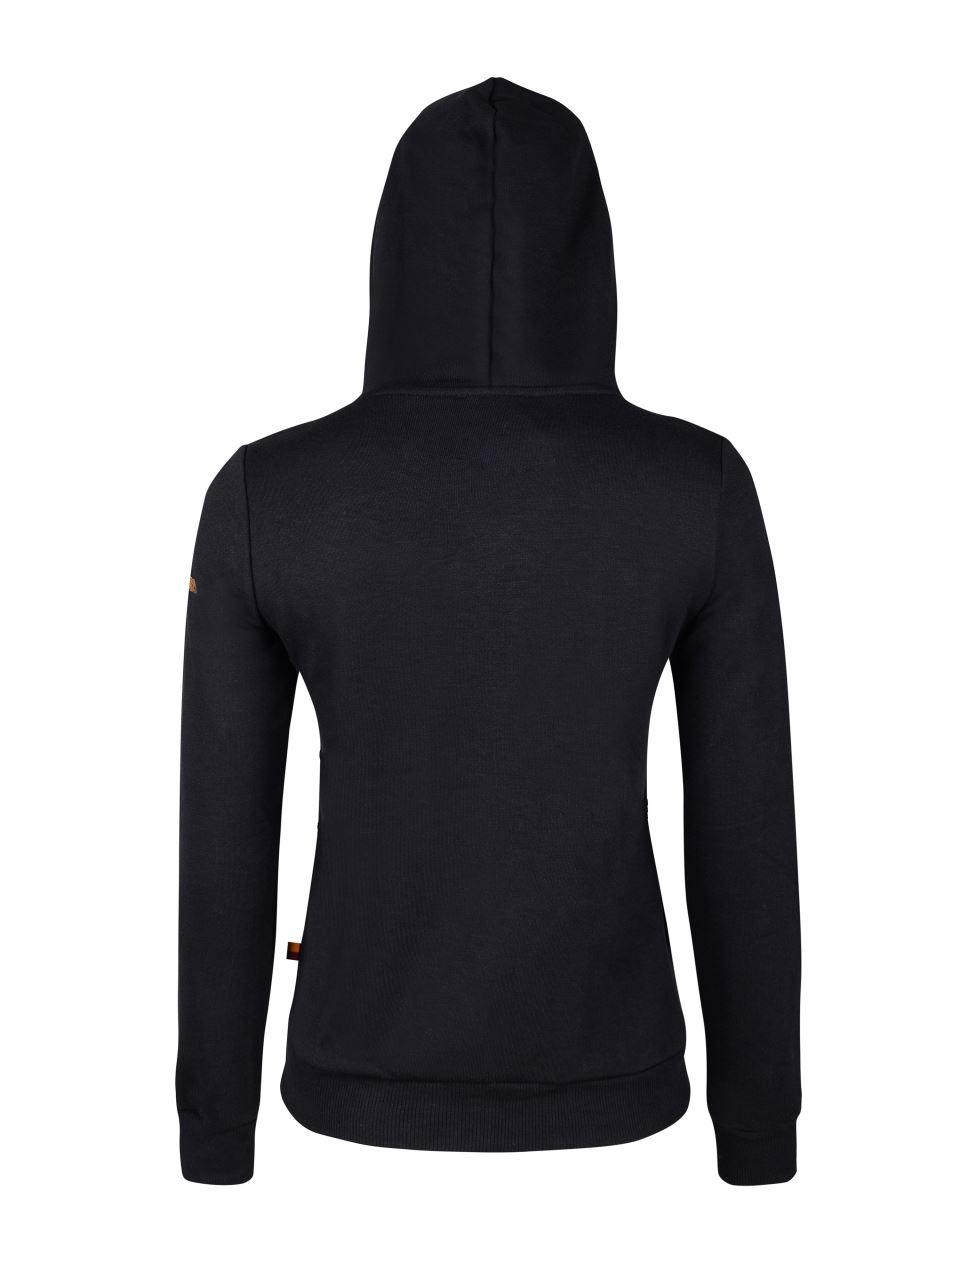 K85121 Sweatshirt